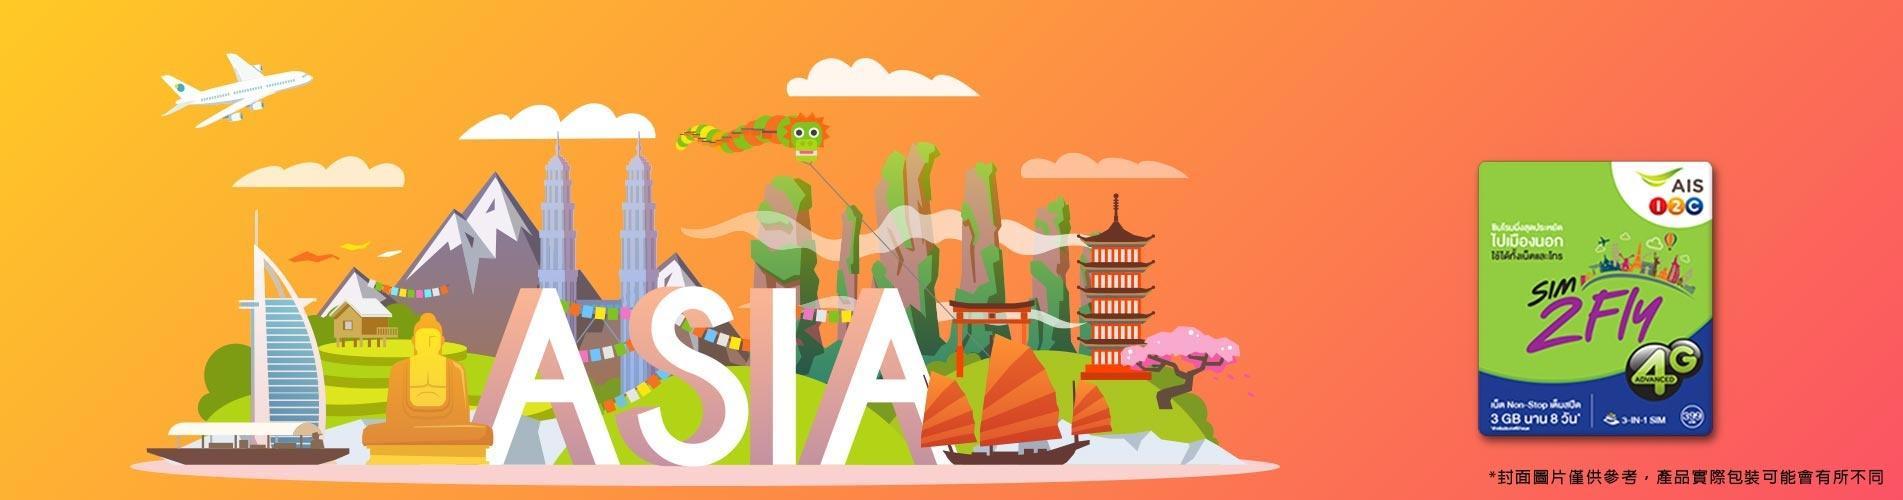 AIS亞洲8日無限數據卡